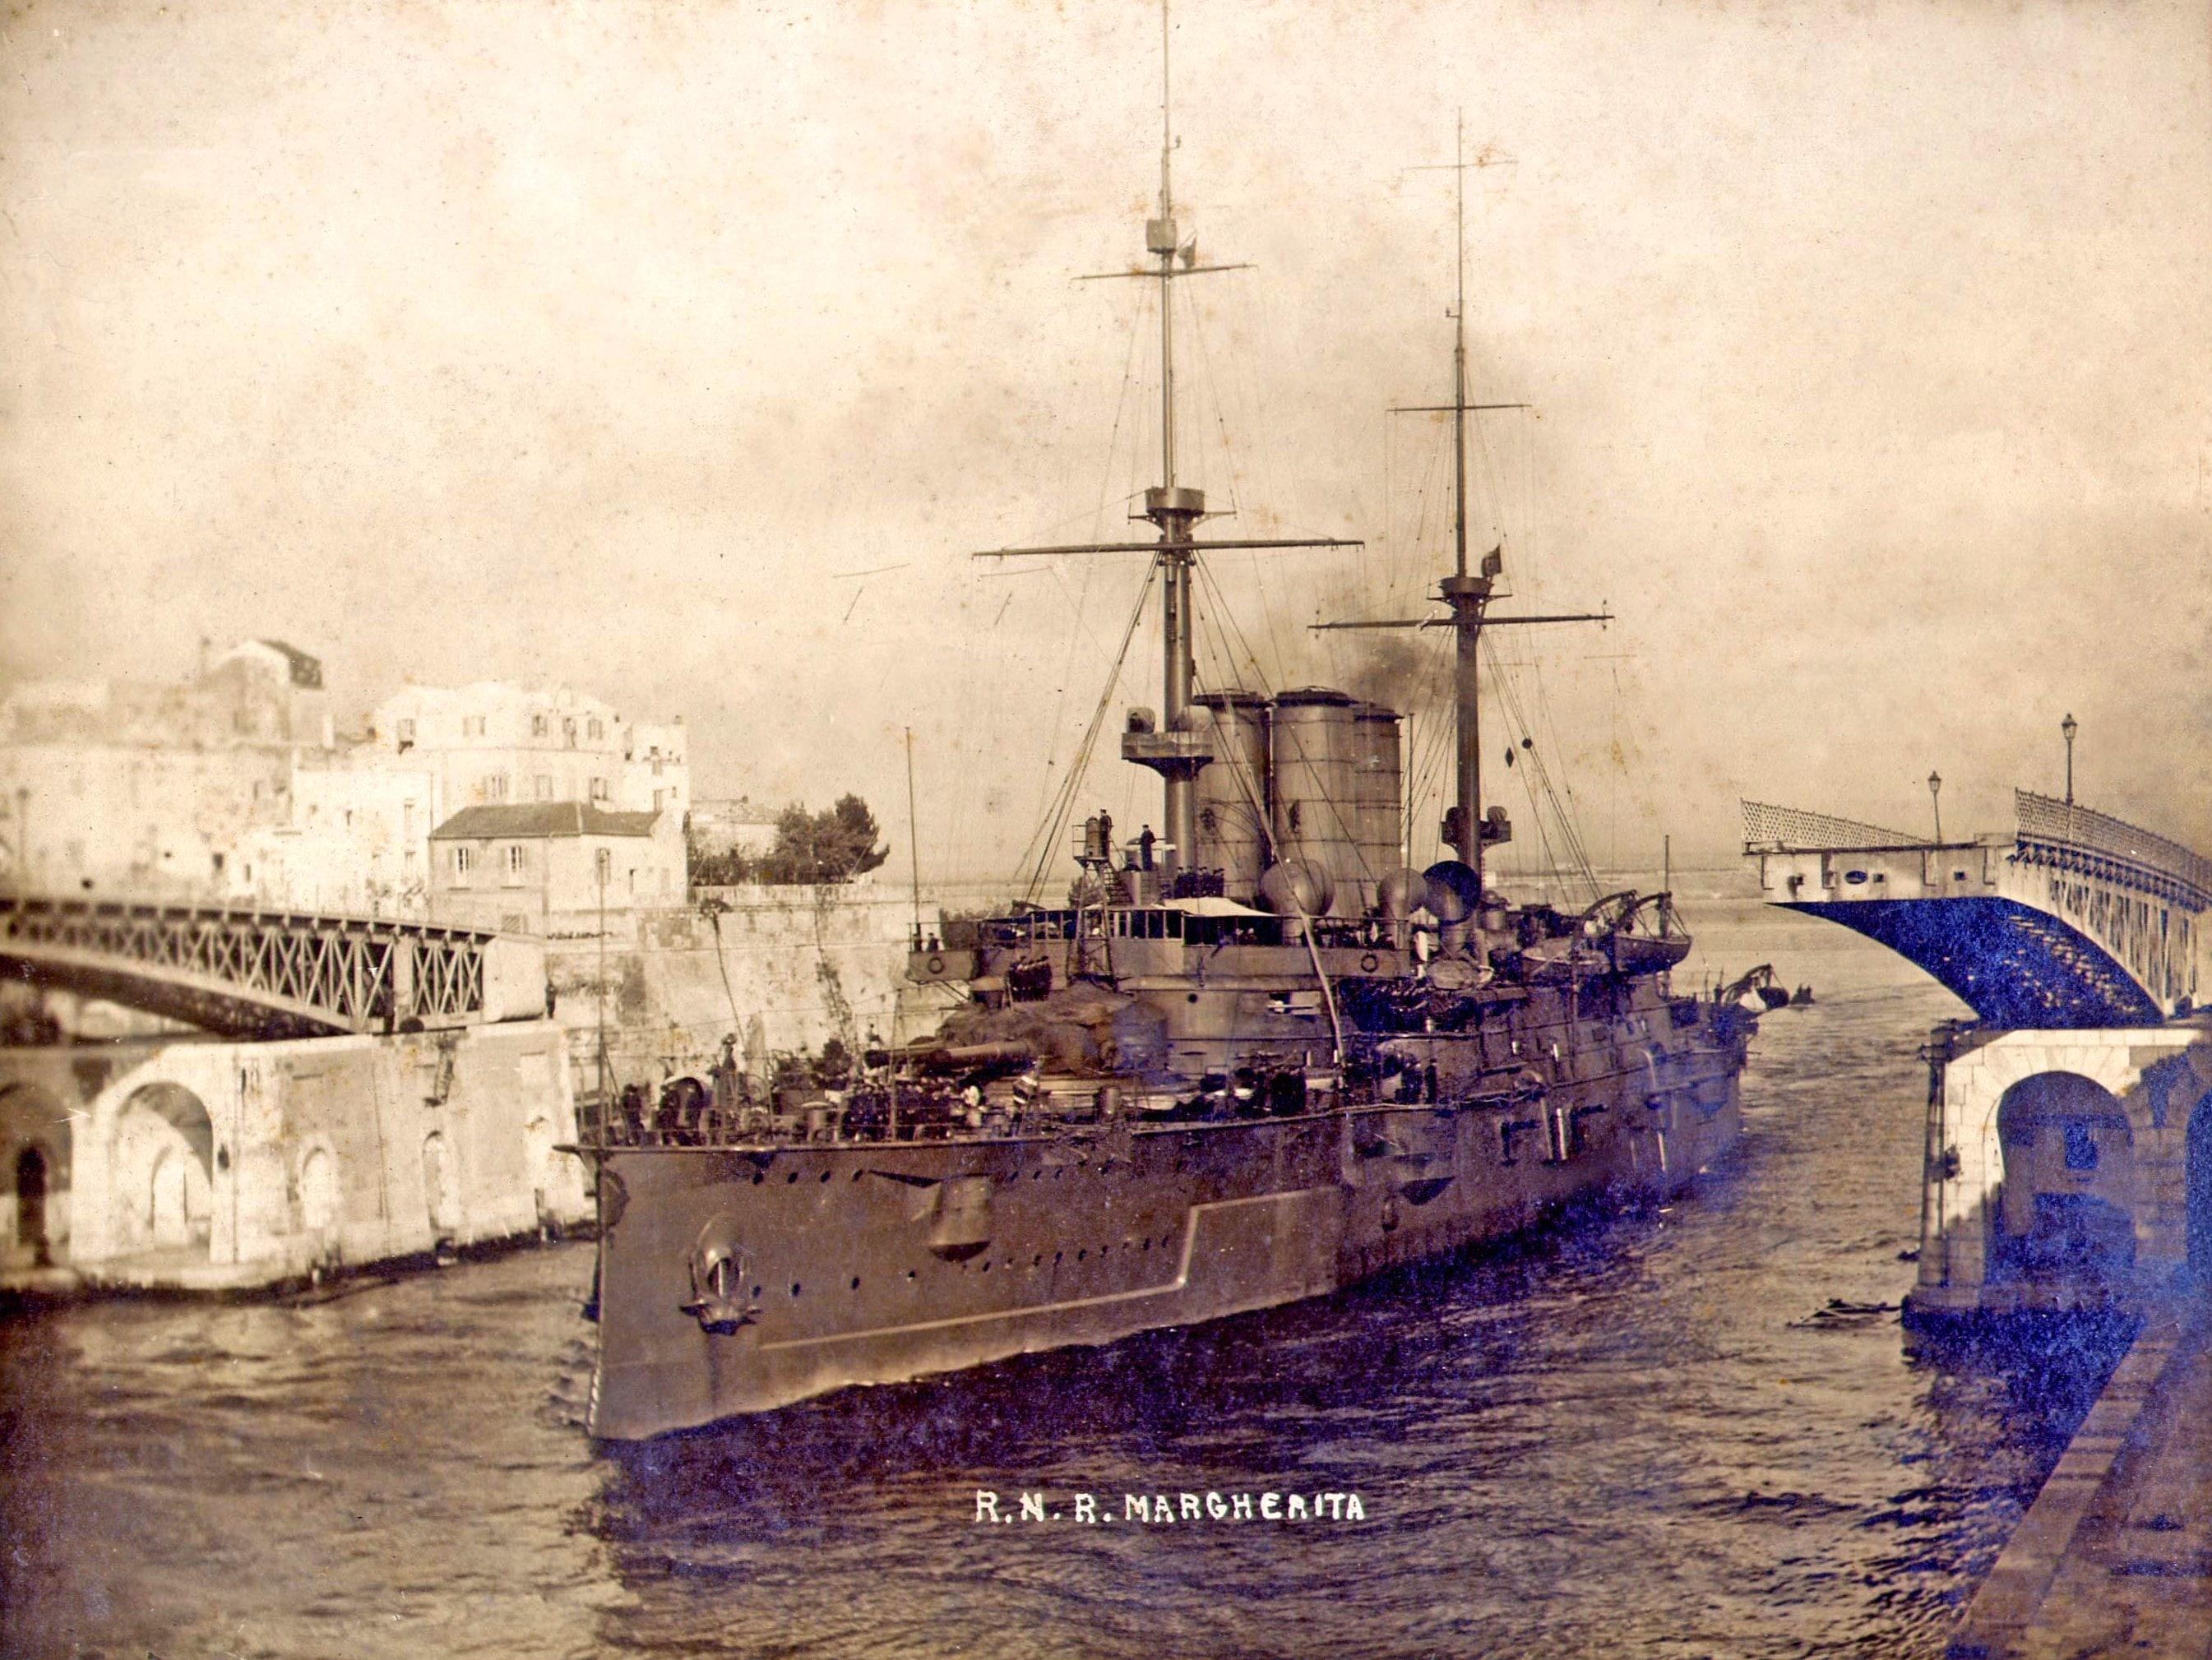 1_1912_Regina_Margherita_foto_studio_Cimpincio_Taranto-2